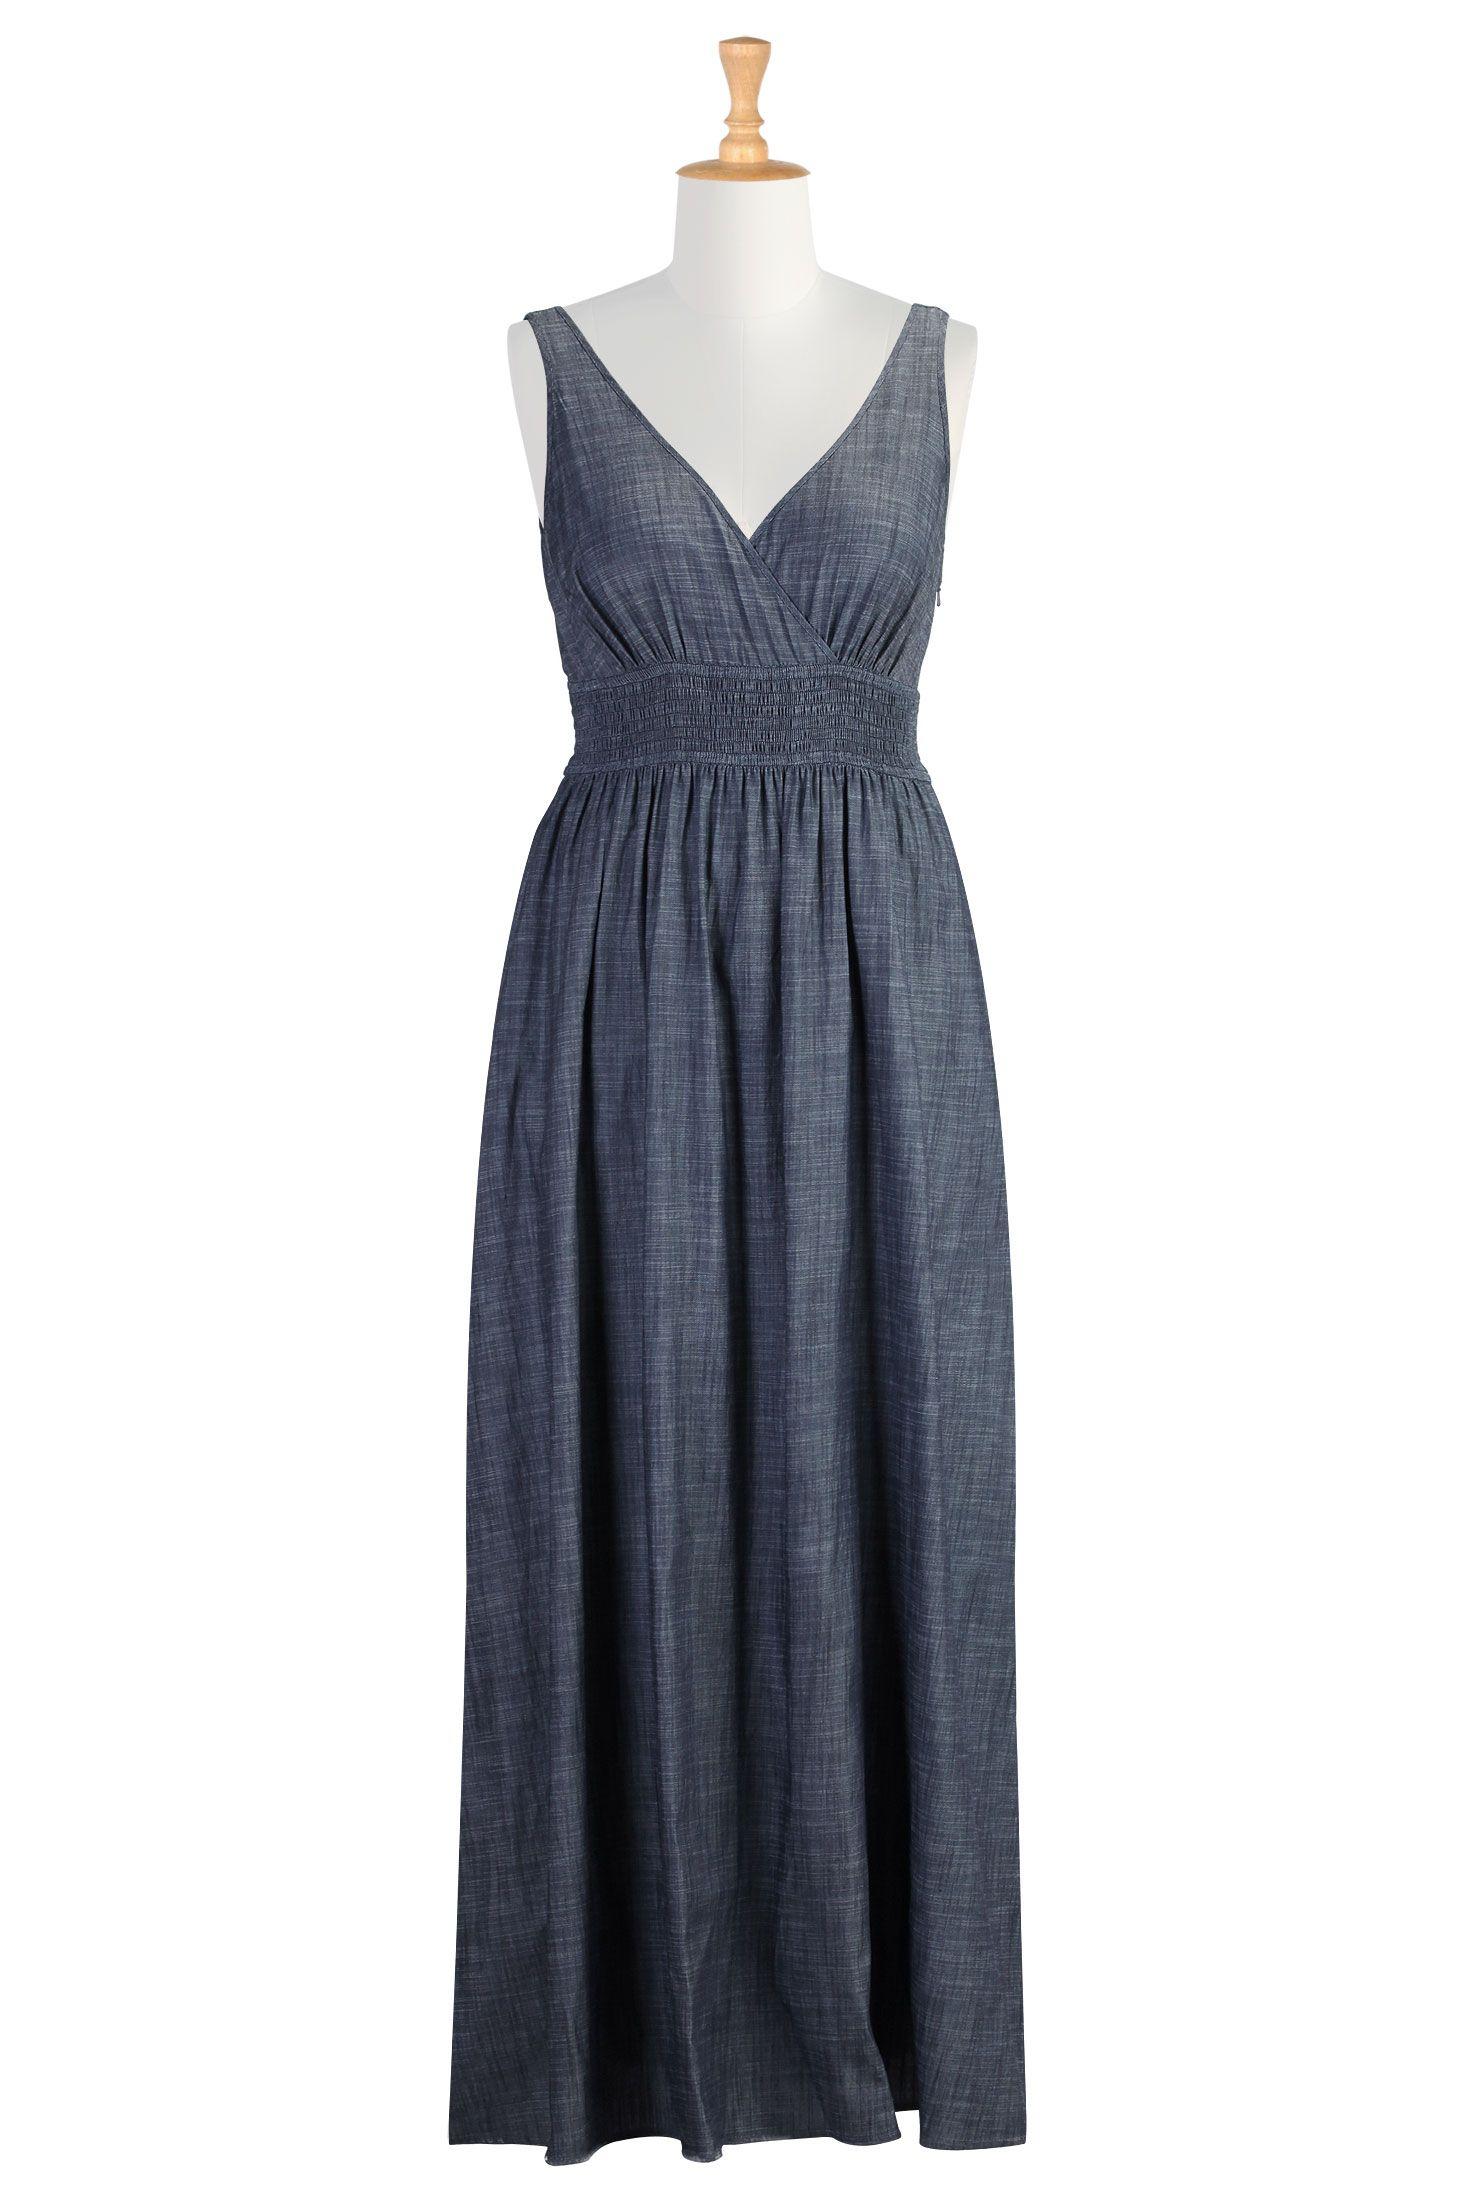 Chambray maxi dress plus size maxi dresses womenus fashion dress